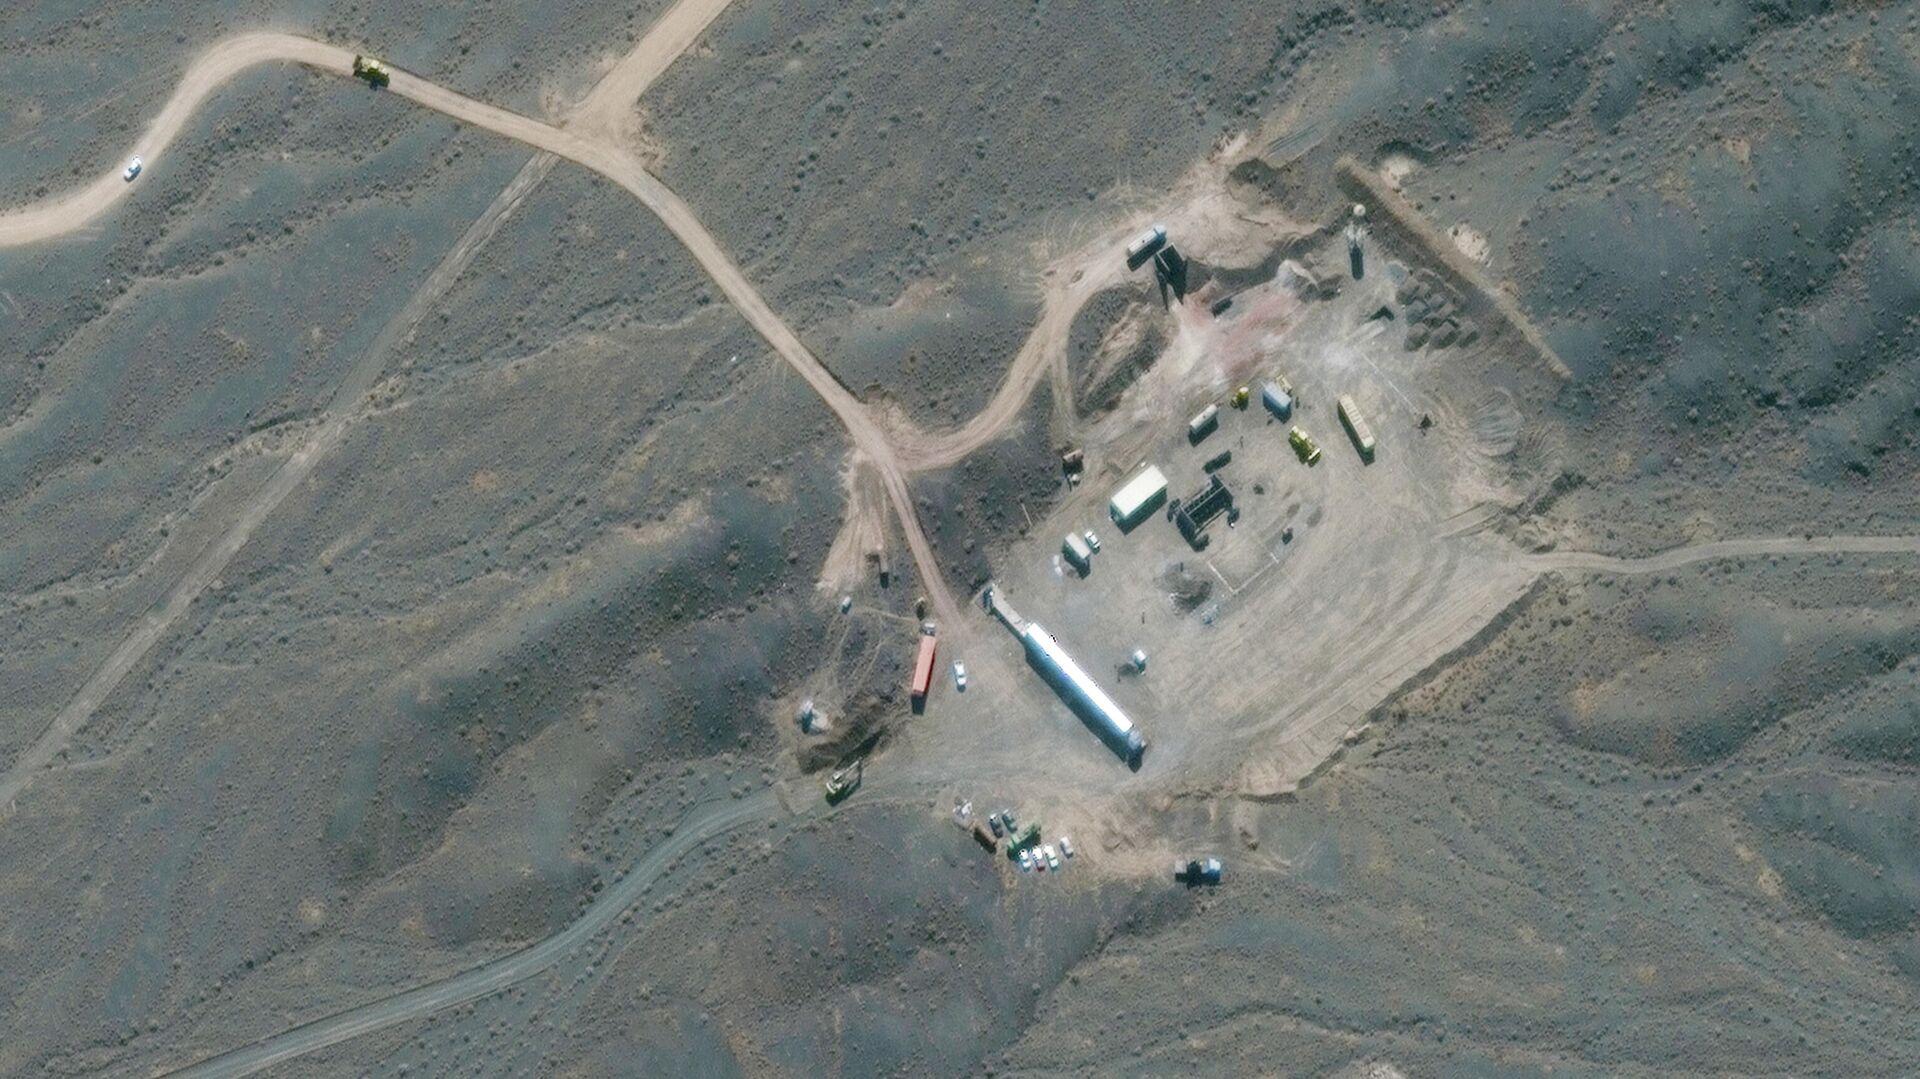 Спутниковый снимок ядерного объекта Ирана в Натанзе - РИА Новости, 1920, 28.11.2020